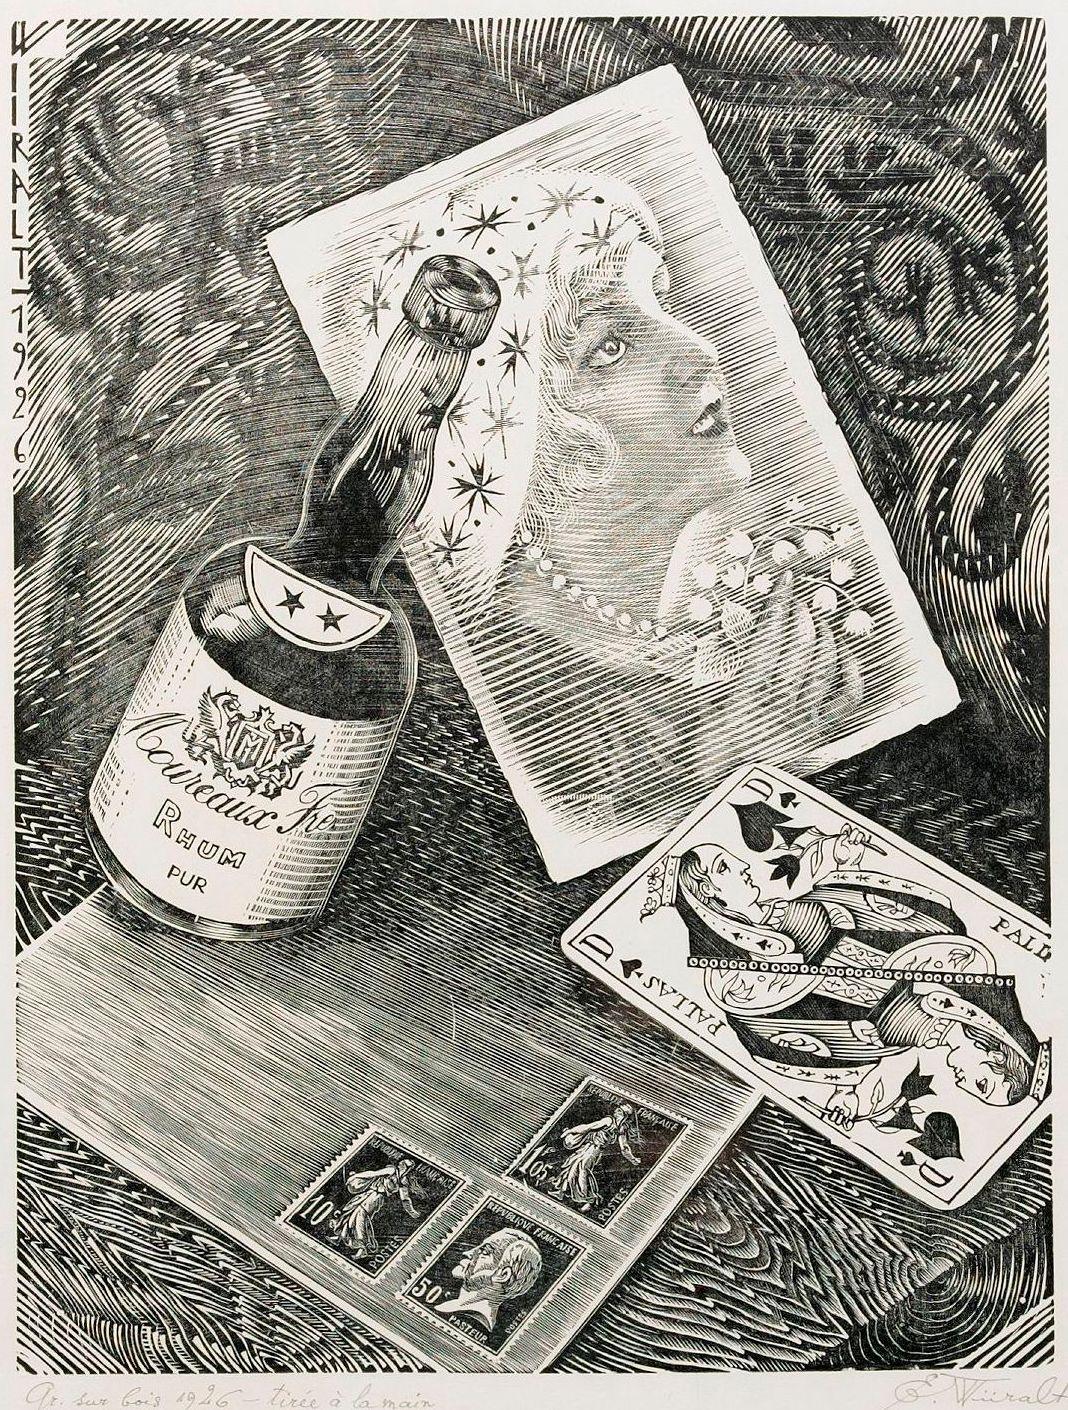 1926_Натюрморт (Still life)_26.5 x 20_ксилография.jpg